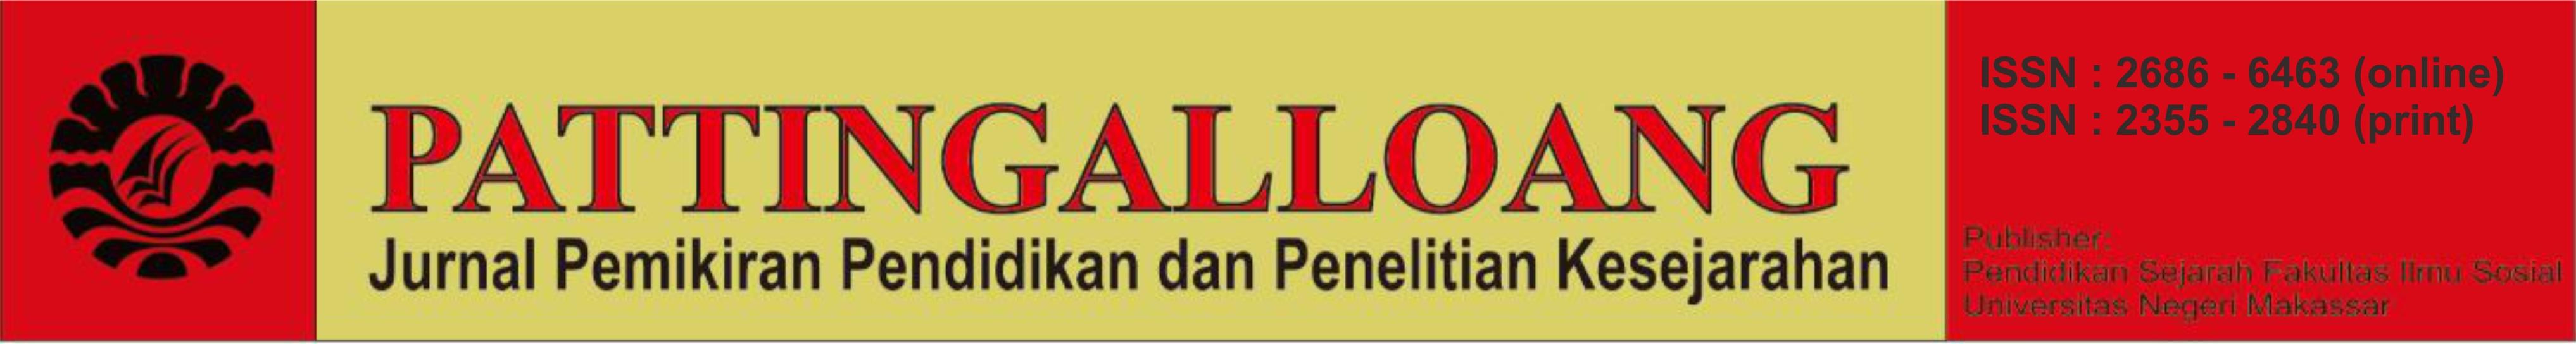 Jurnal Pattingalloang